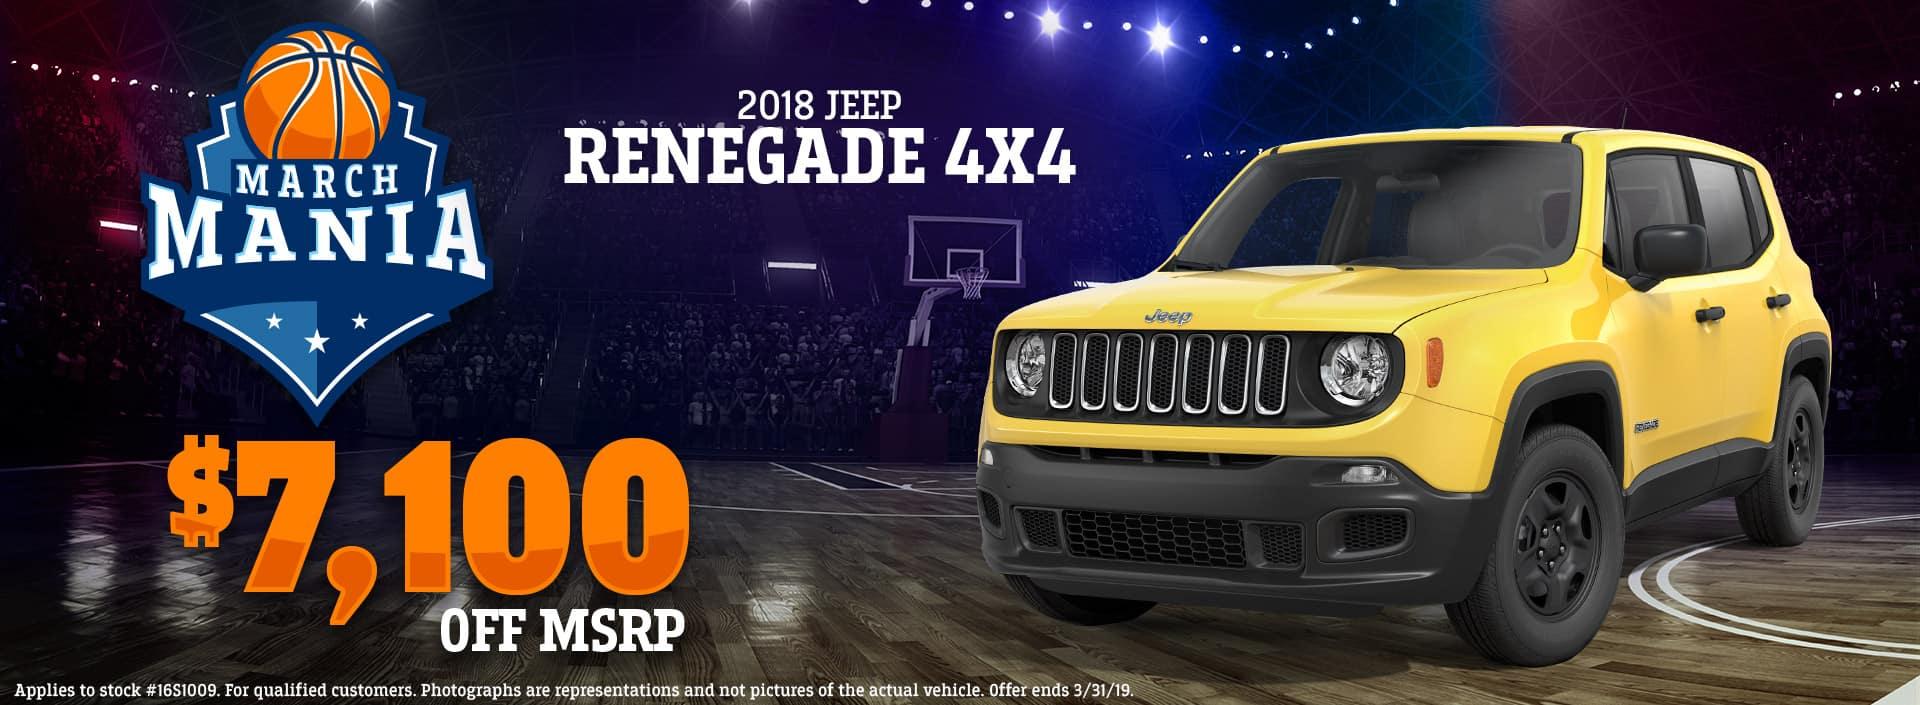 3.19 - 2018 Jeep Renegade 4x4